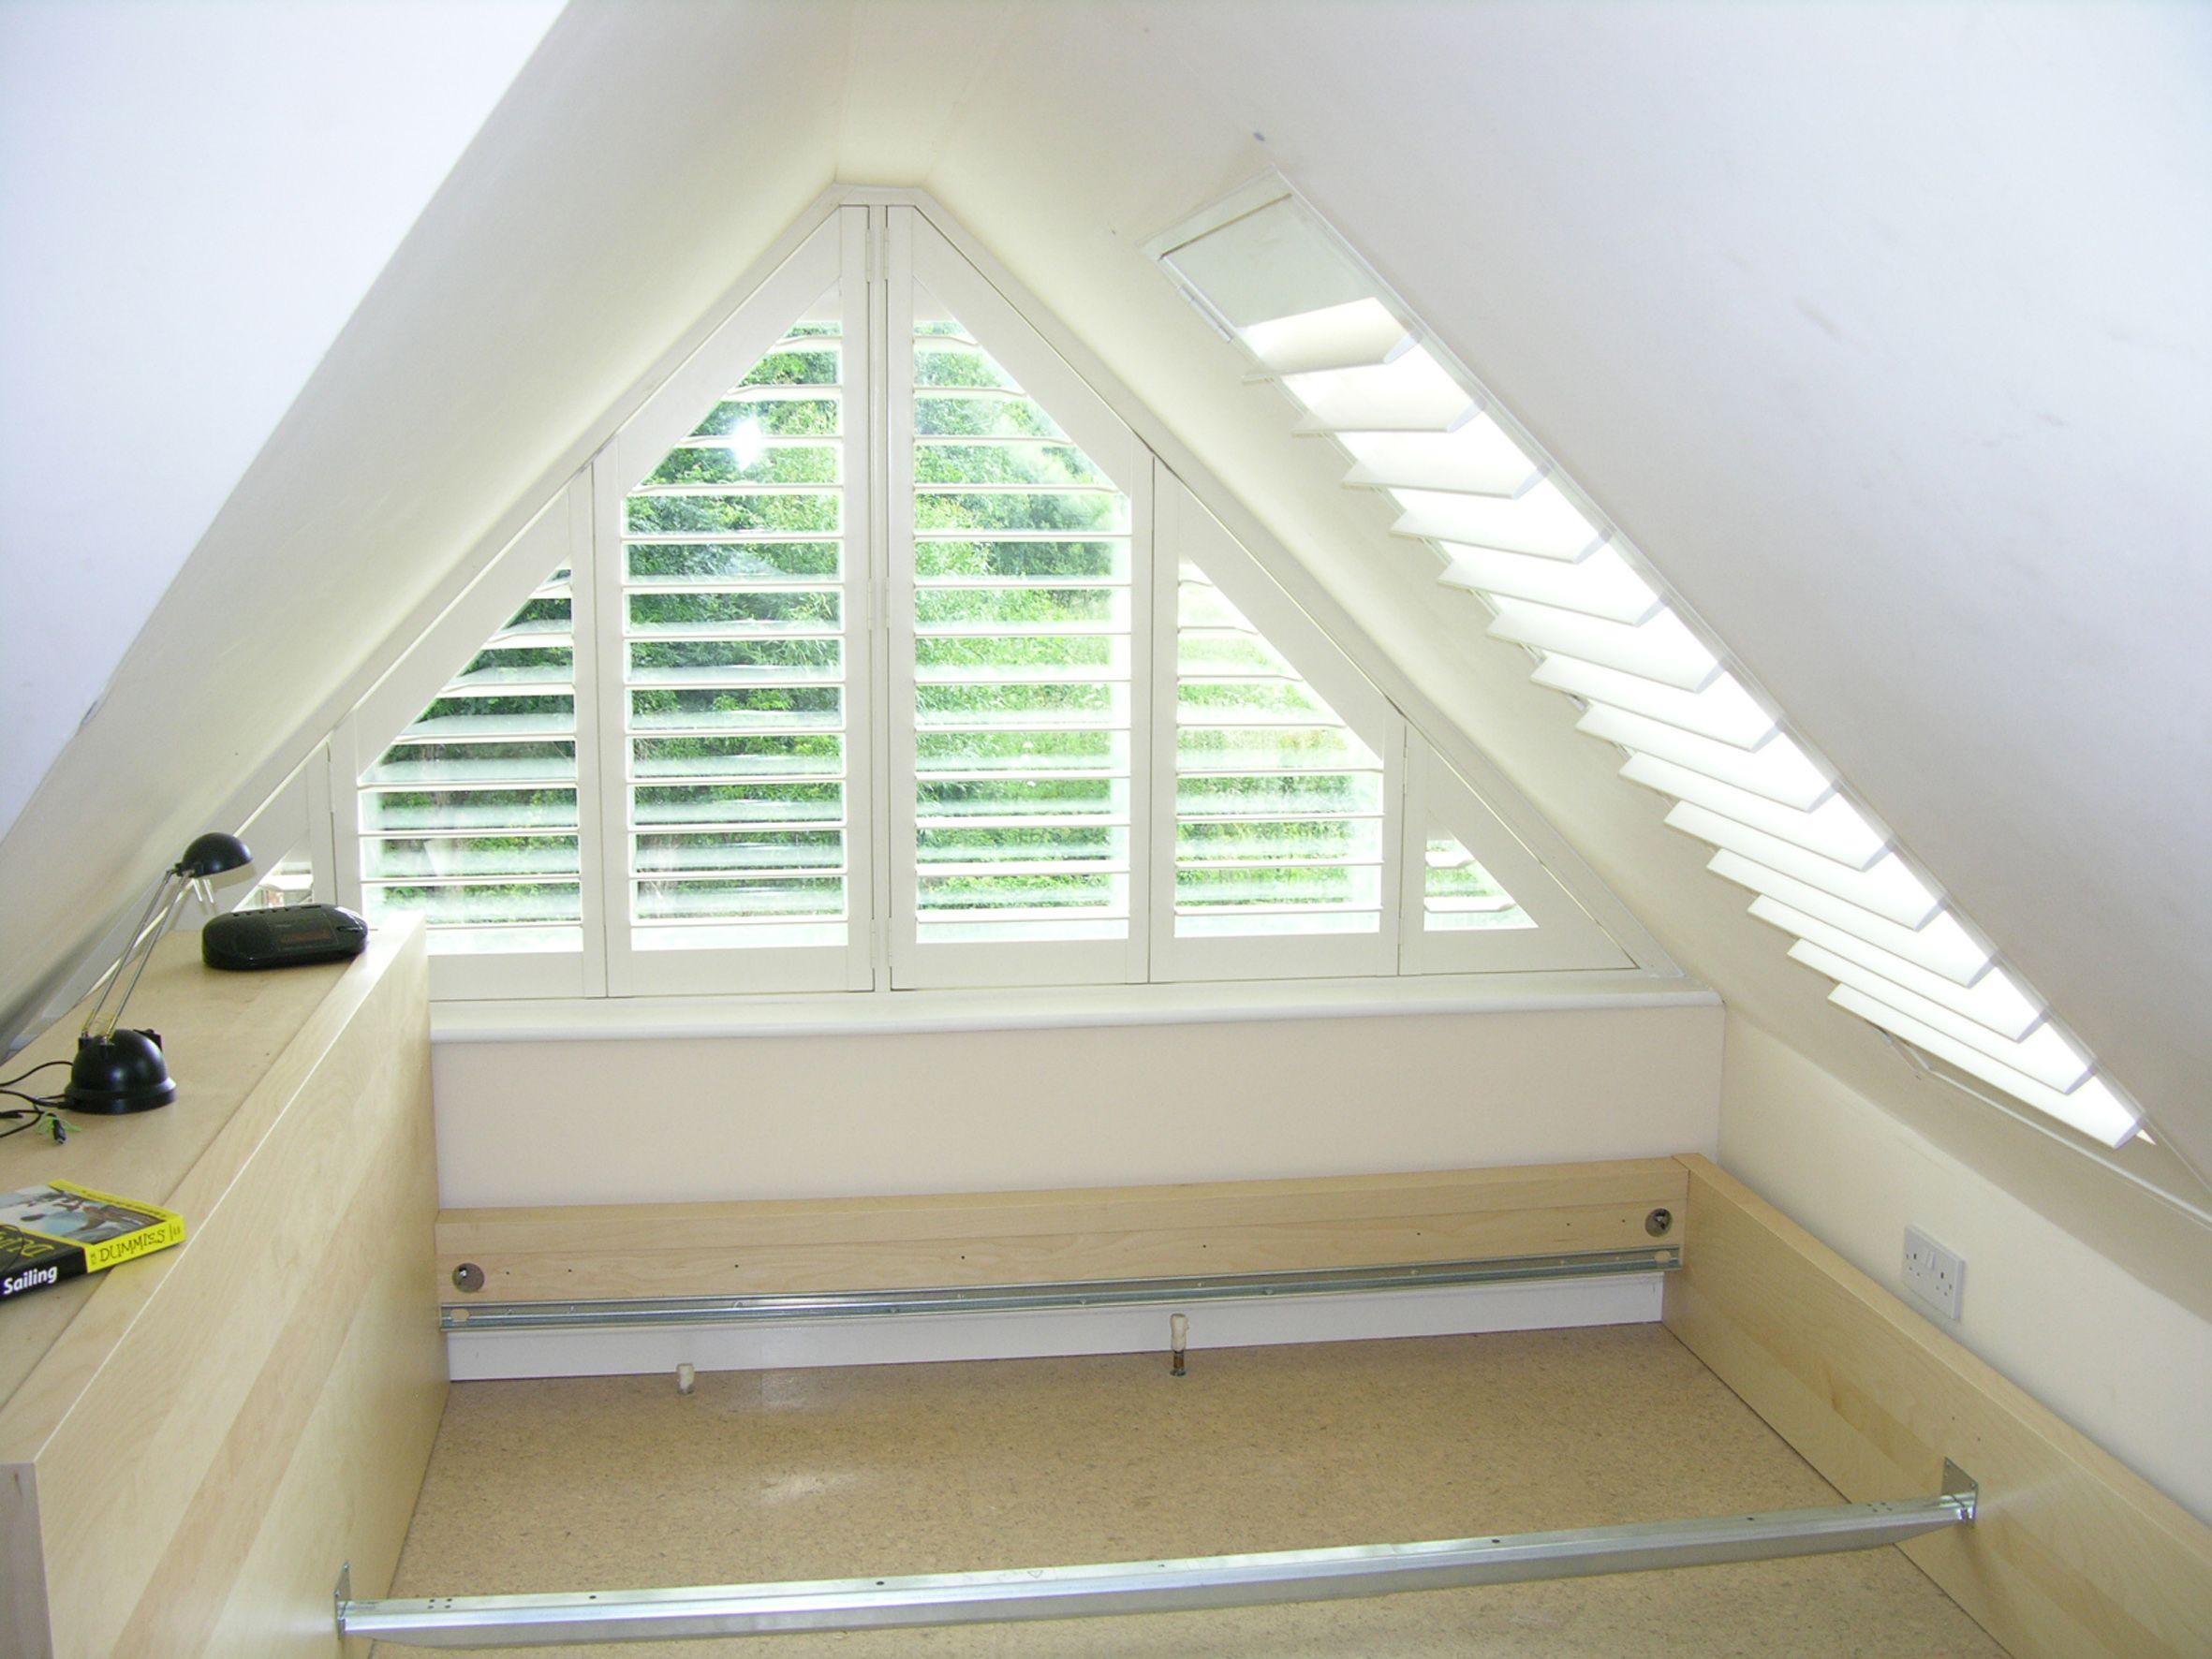 Triangle windows photos supplying wooden window shutters for - Triangle Windows Photos Supplying Wooden Window Shutters For Arched And Triangle